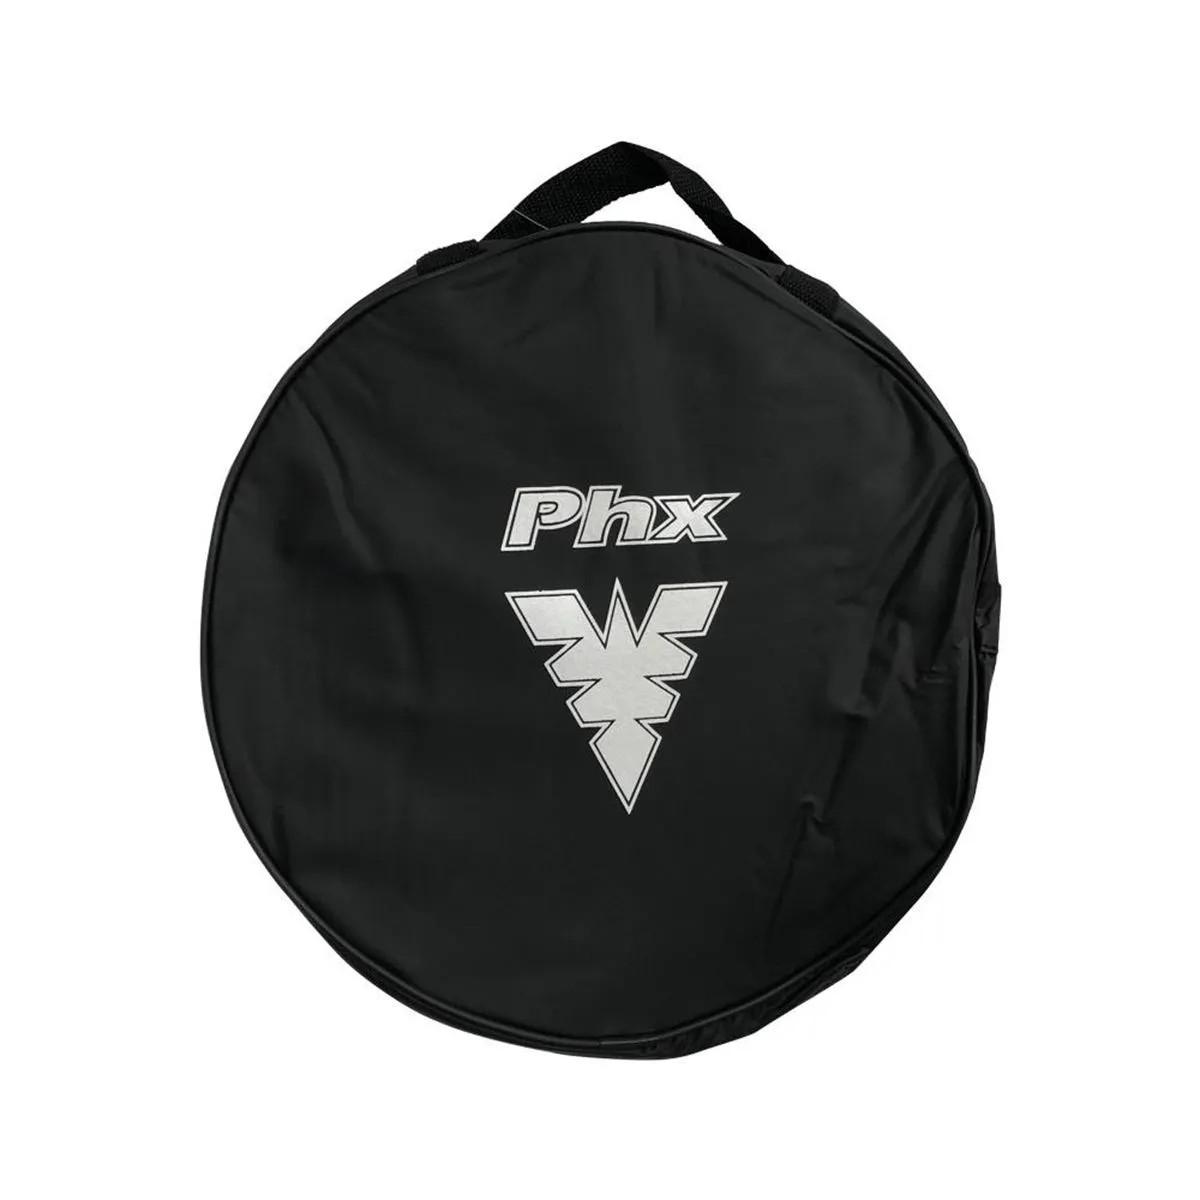 Bag Capa Courino Phx PAA027 Preta para Pandeiro 12